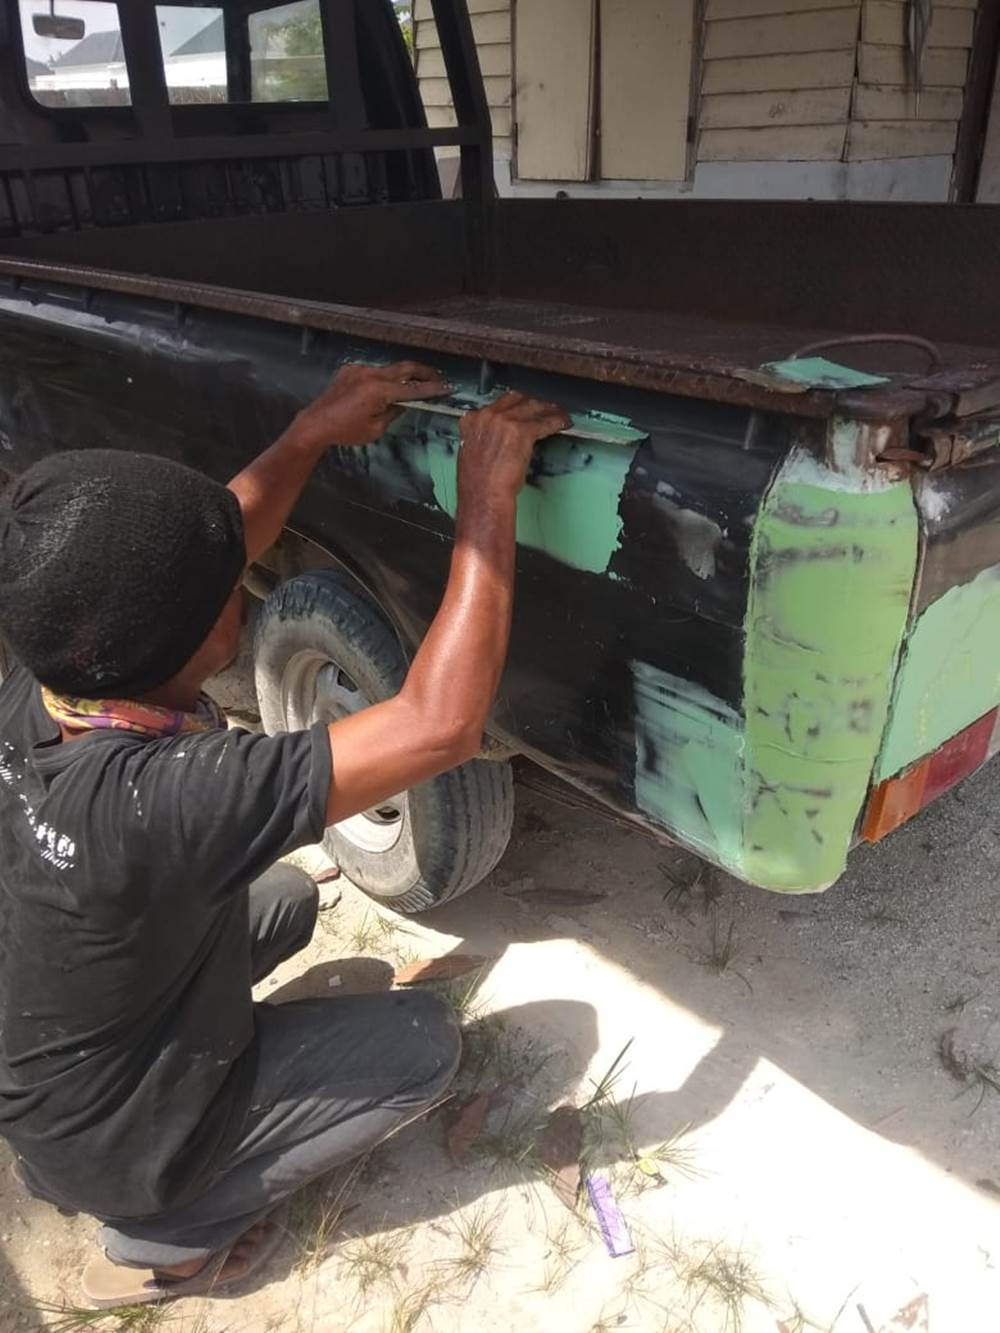 BRILLIANT AUTOMOTIF 50 - Brilliant Automotif Body Repair and Paint Specialist - Bengkel Cat dan Body Repair Daerah Labuh Baru Pekanbaru